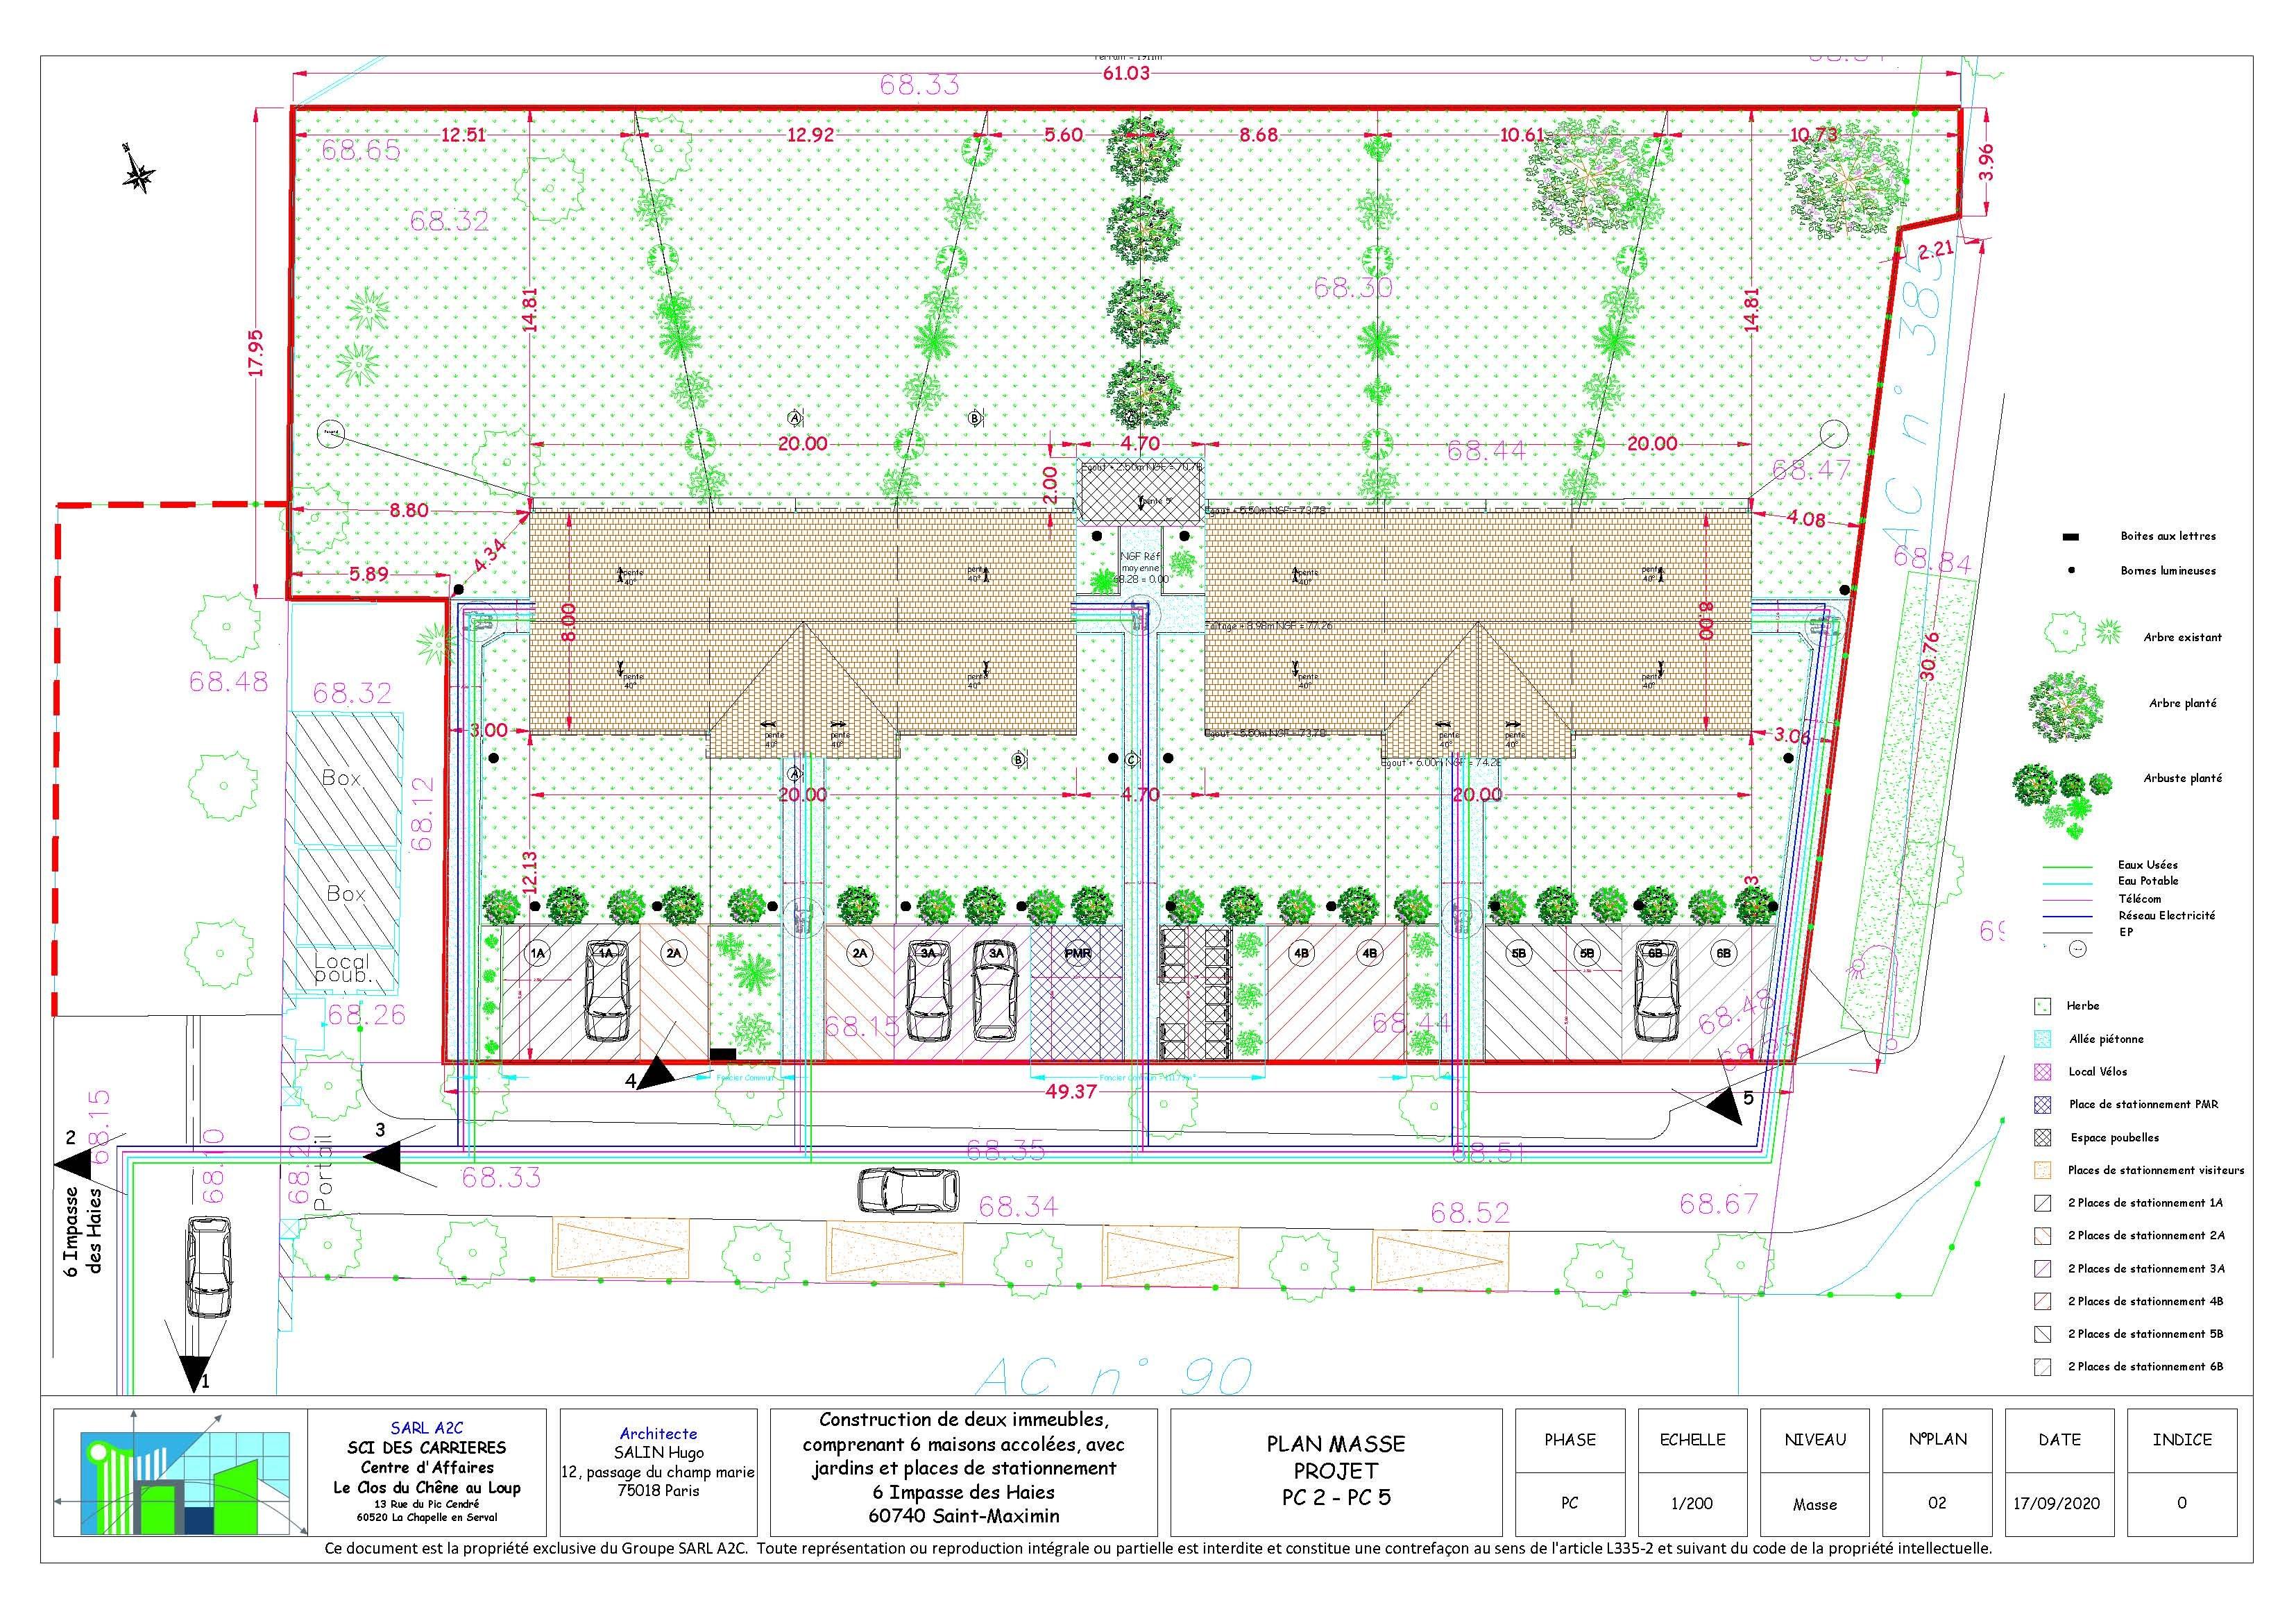 SC_PC_Projet Saint Maximin_02_Plan Masse Projet